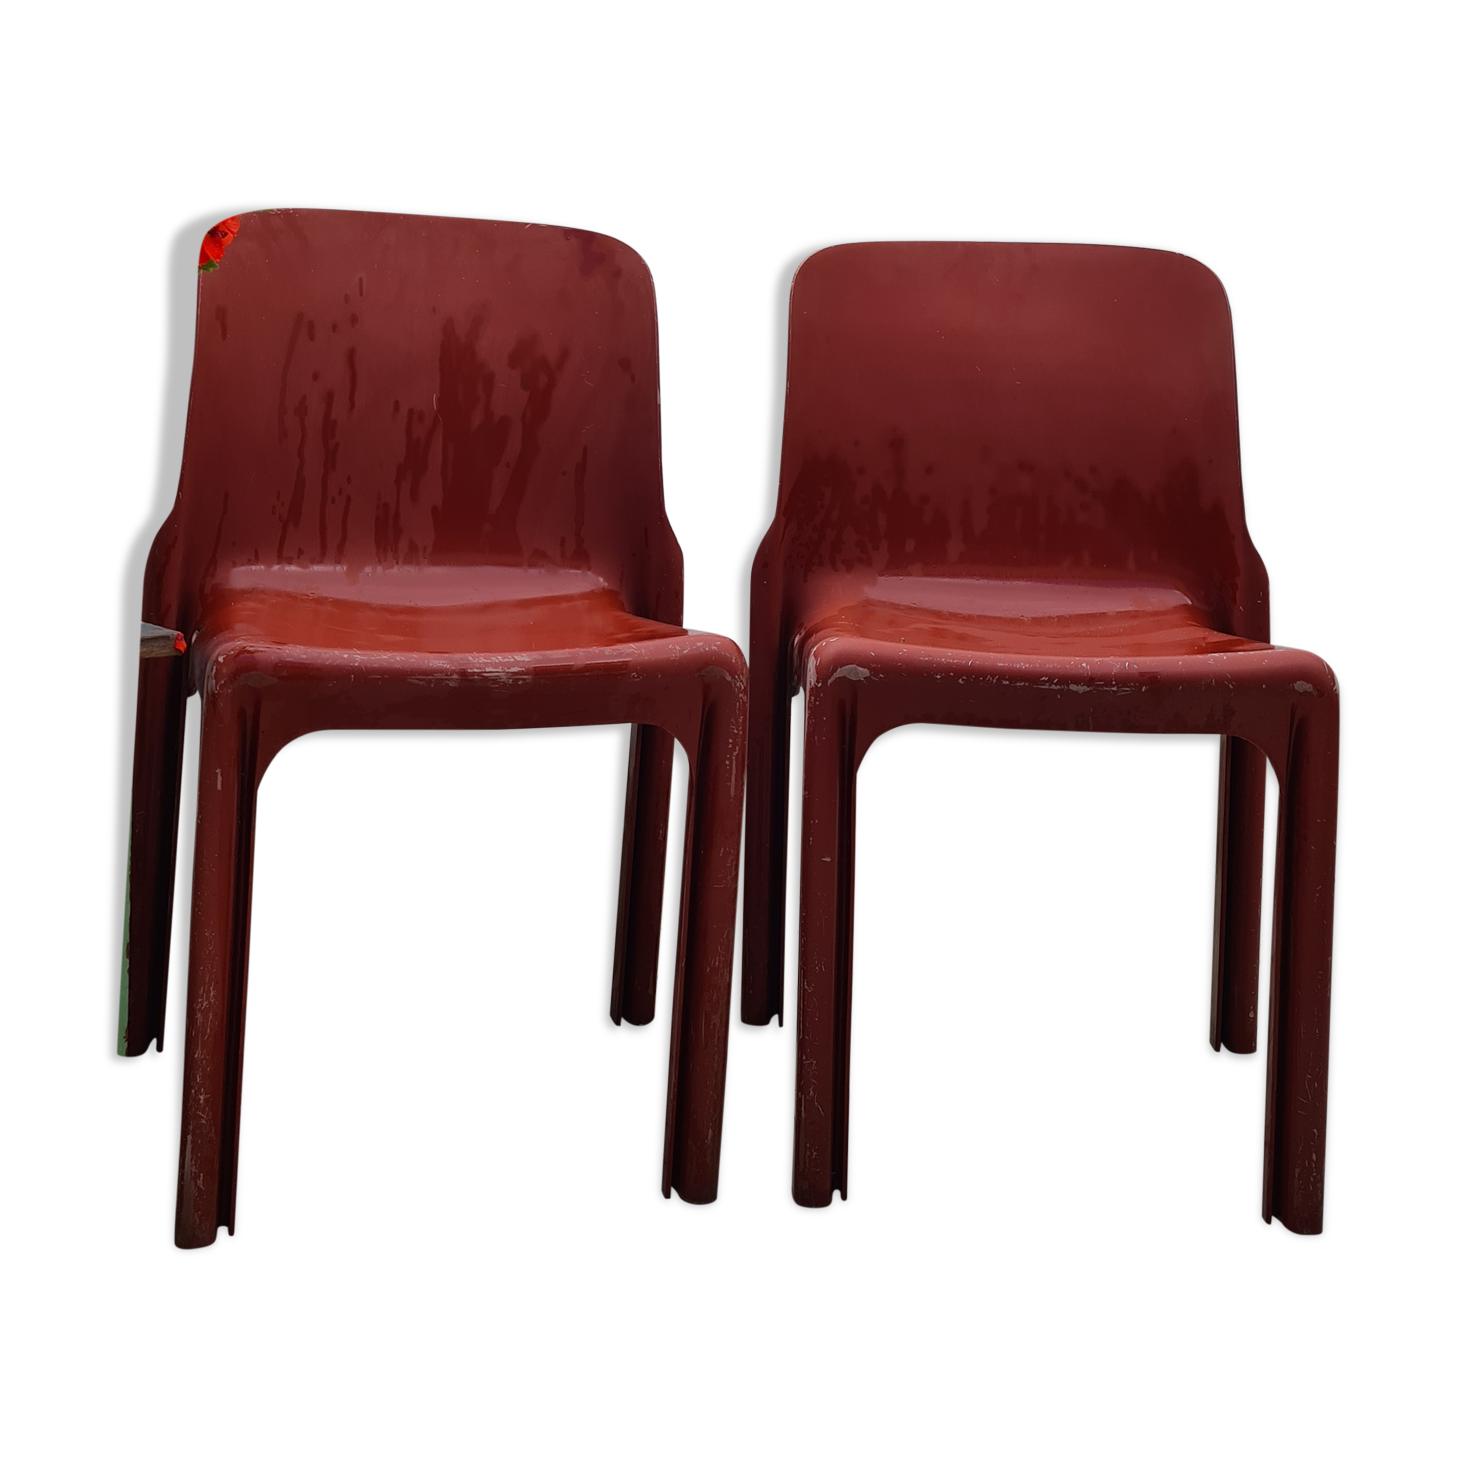 2 chaises Artemide Selene par Vico Magistretti